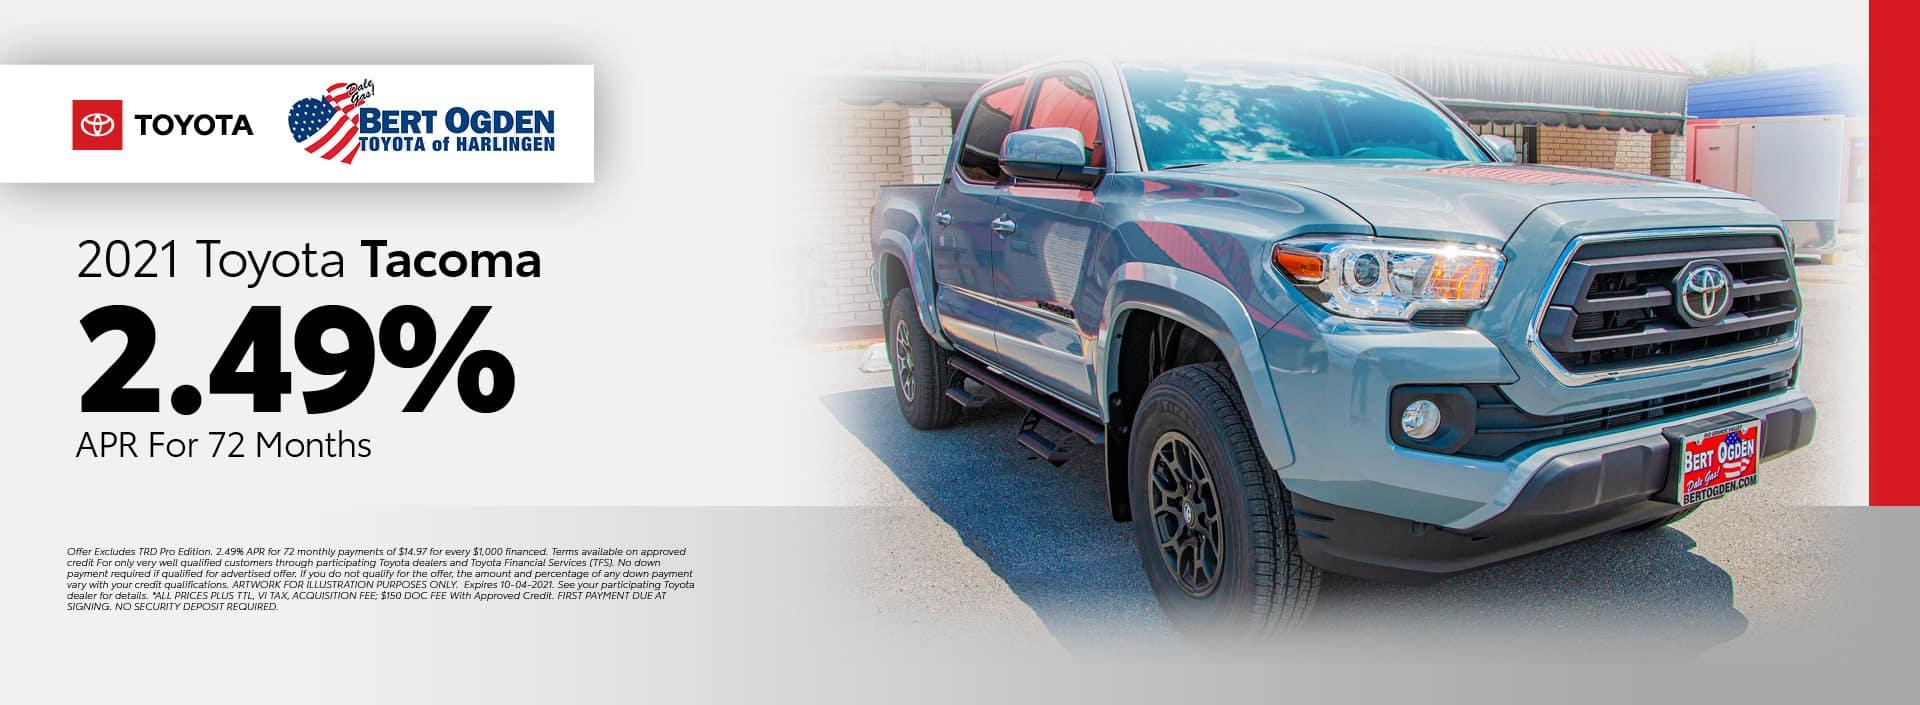 2021 Toyota Tacoma APR Offer | Bert Ogden Toyota in Harlingen, Texas